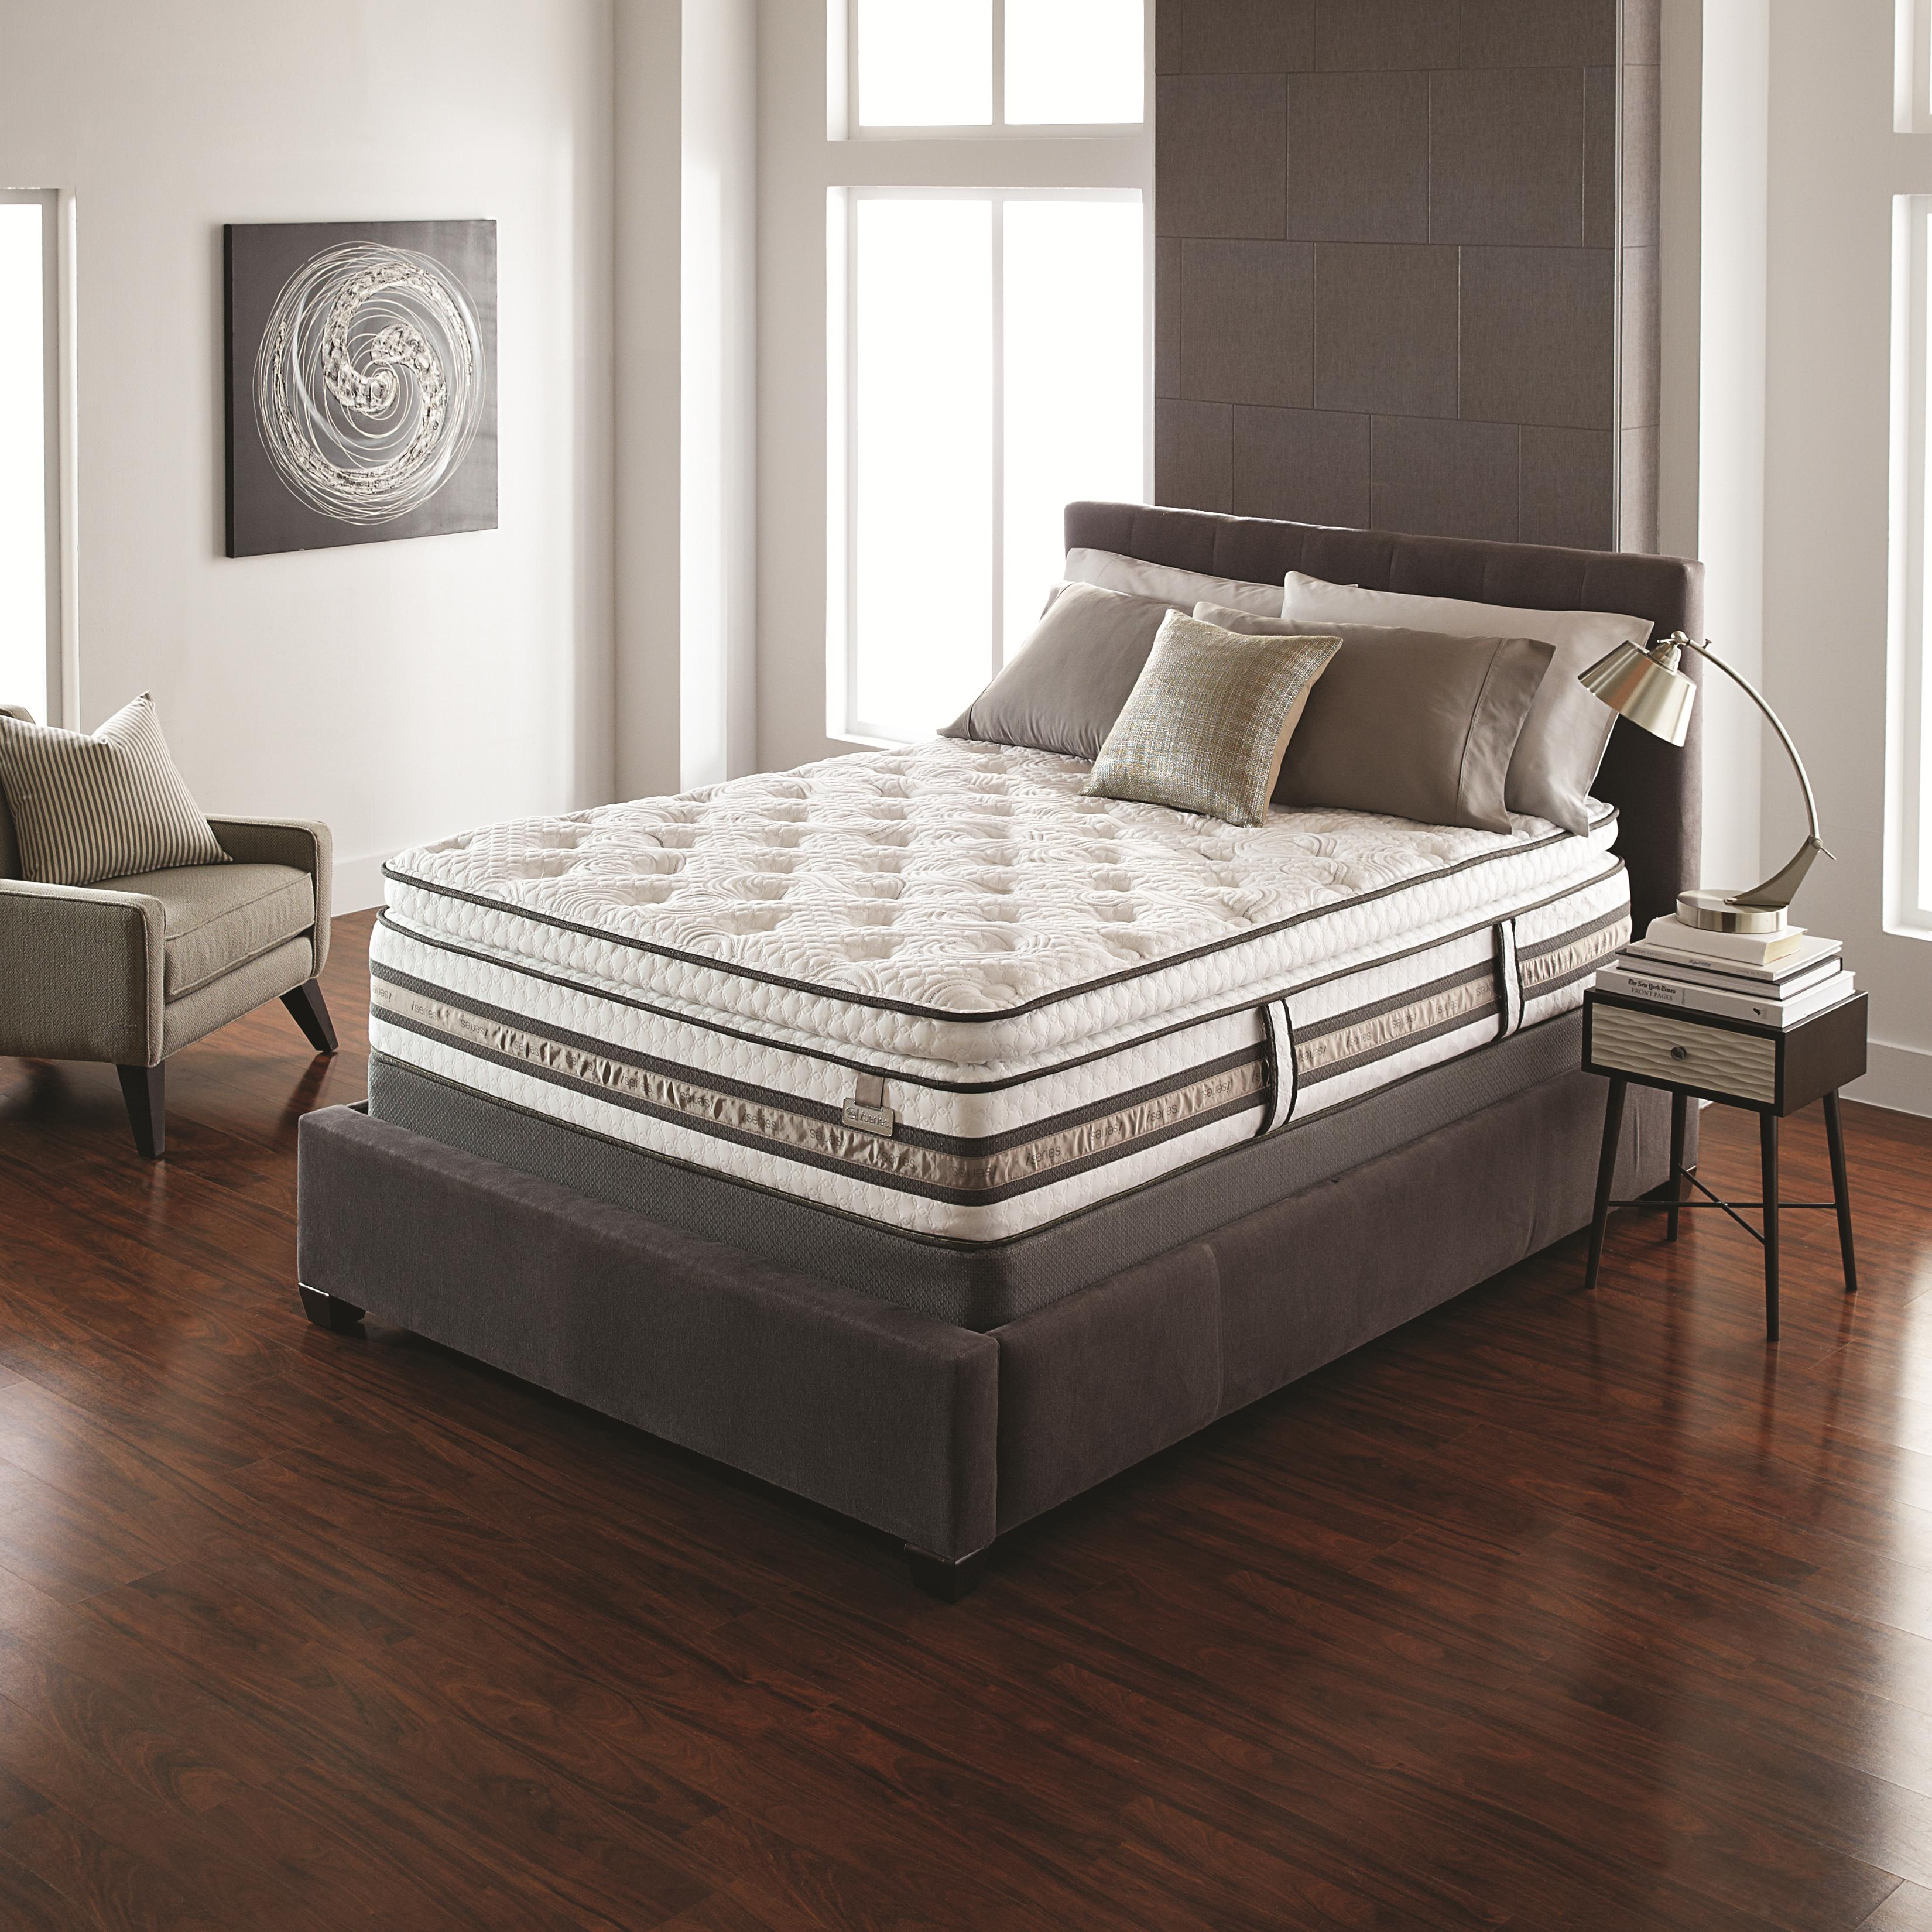 Serta iSeries Merit Queen Super Pillow Top Mattress - Item Number: 400073Q